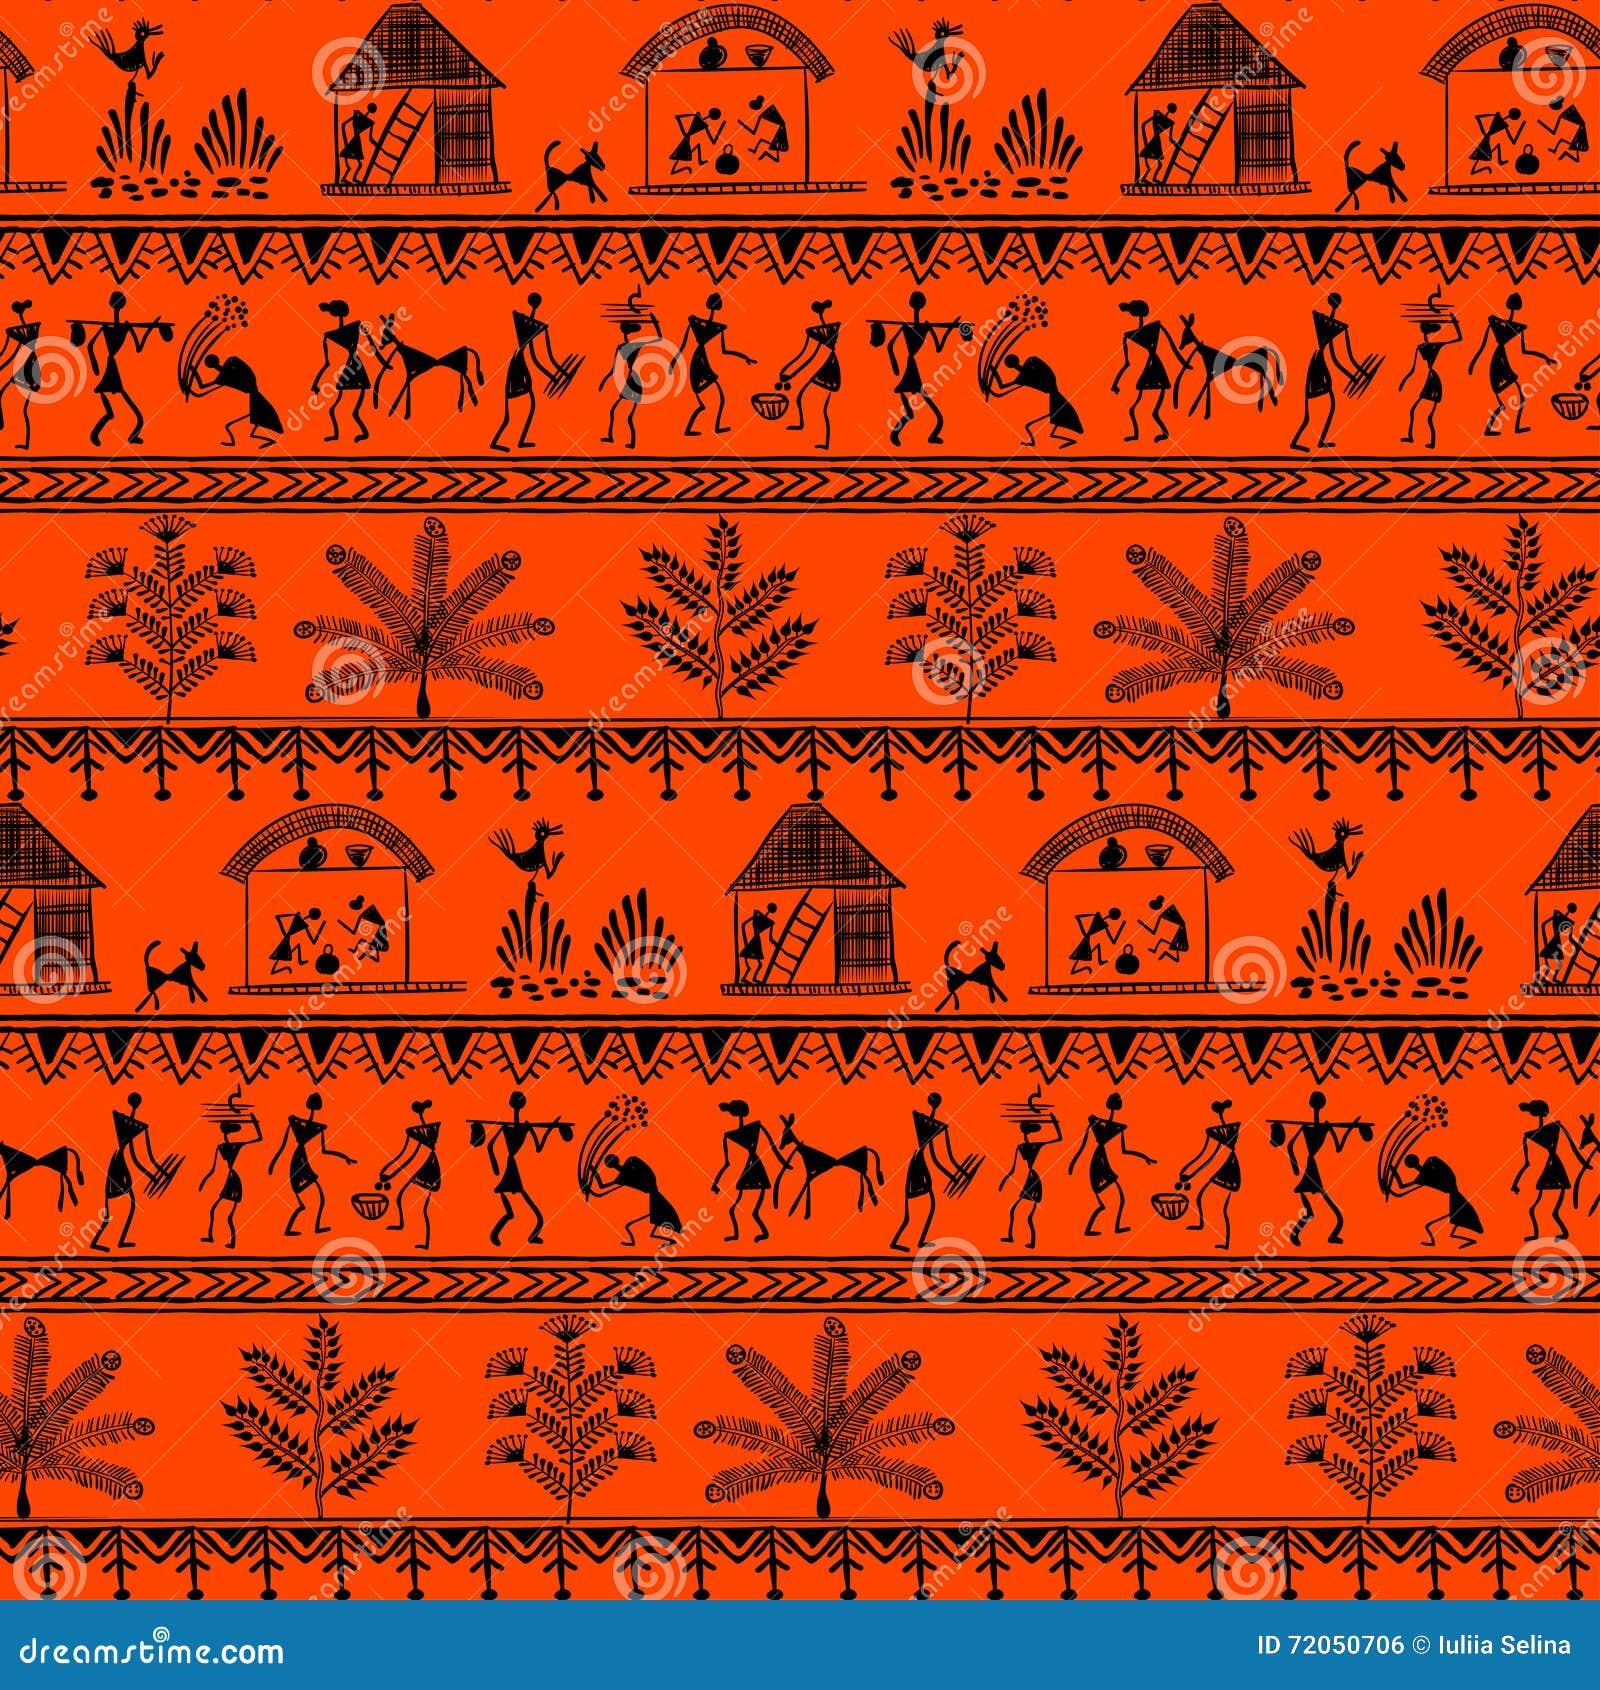 Warli Tribal Art 9 Stock Illustration - Image: 72050706